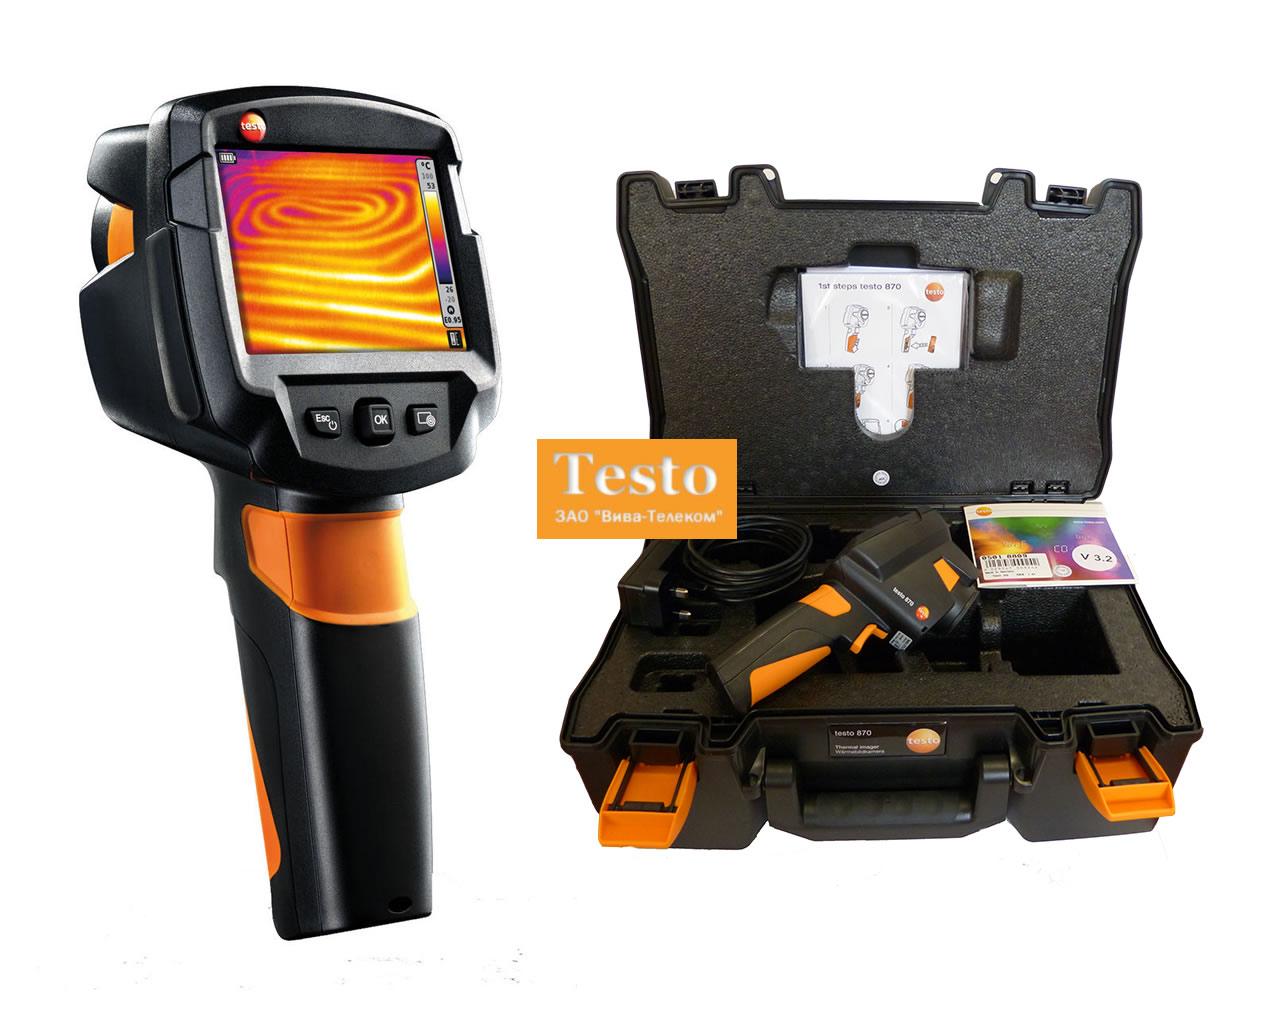 тепловизор testo 870-1 инструкция по эксплуатации